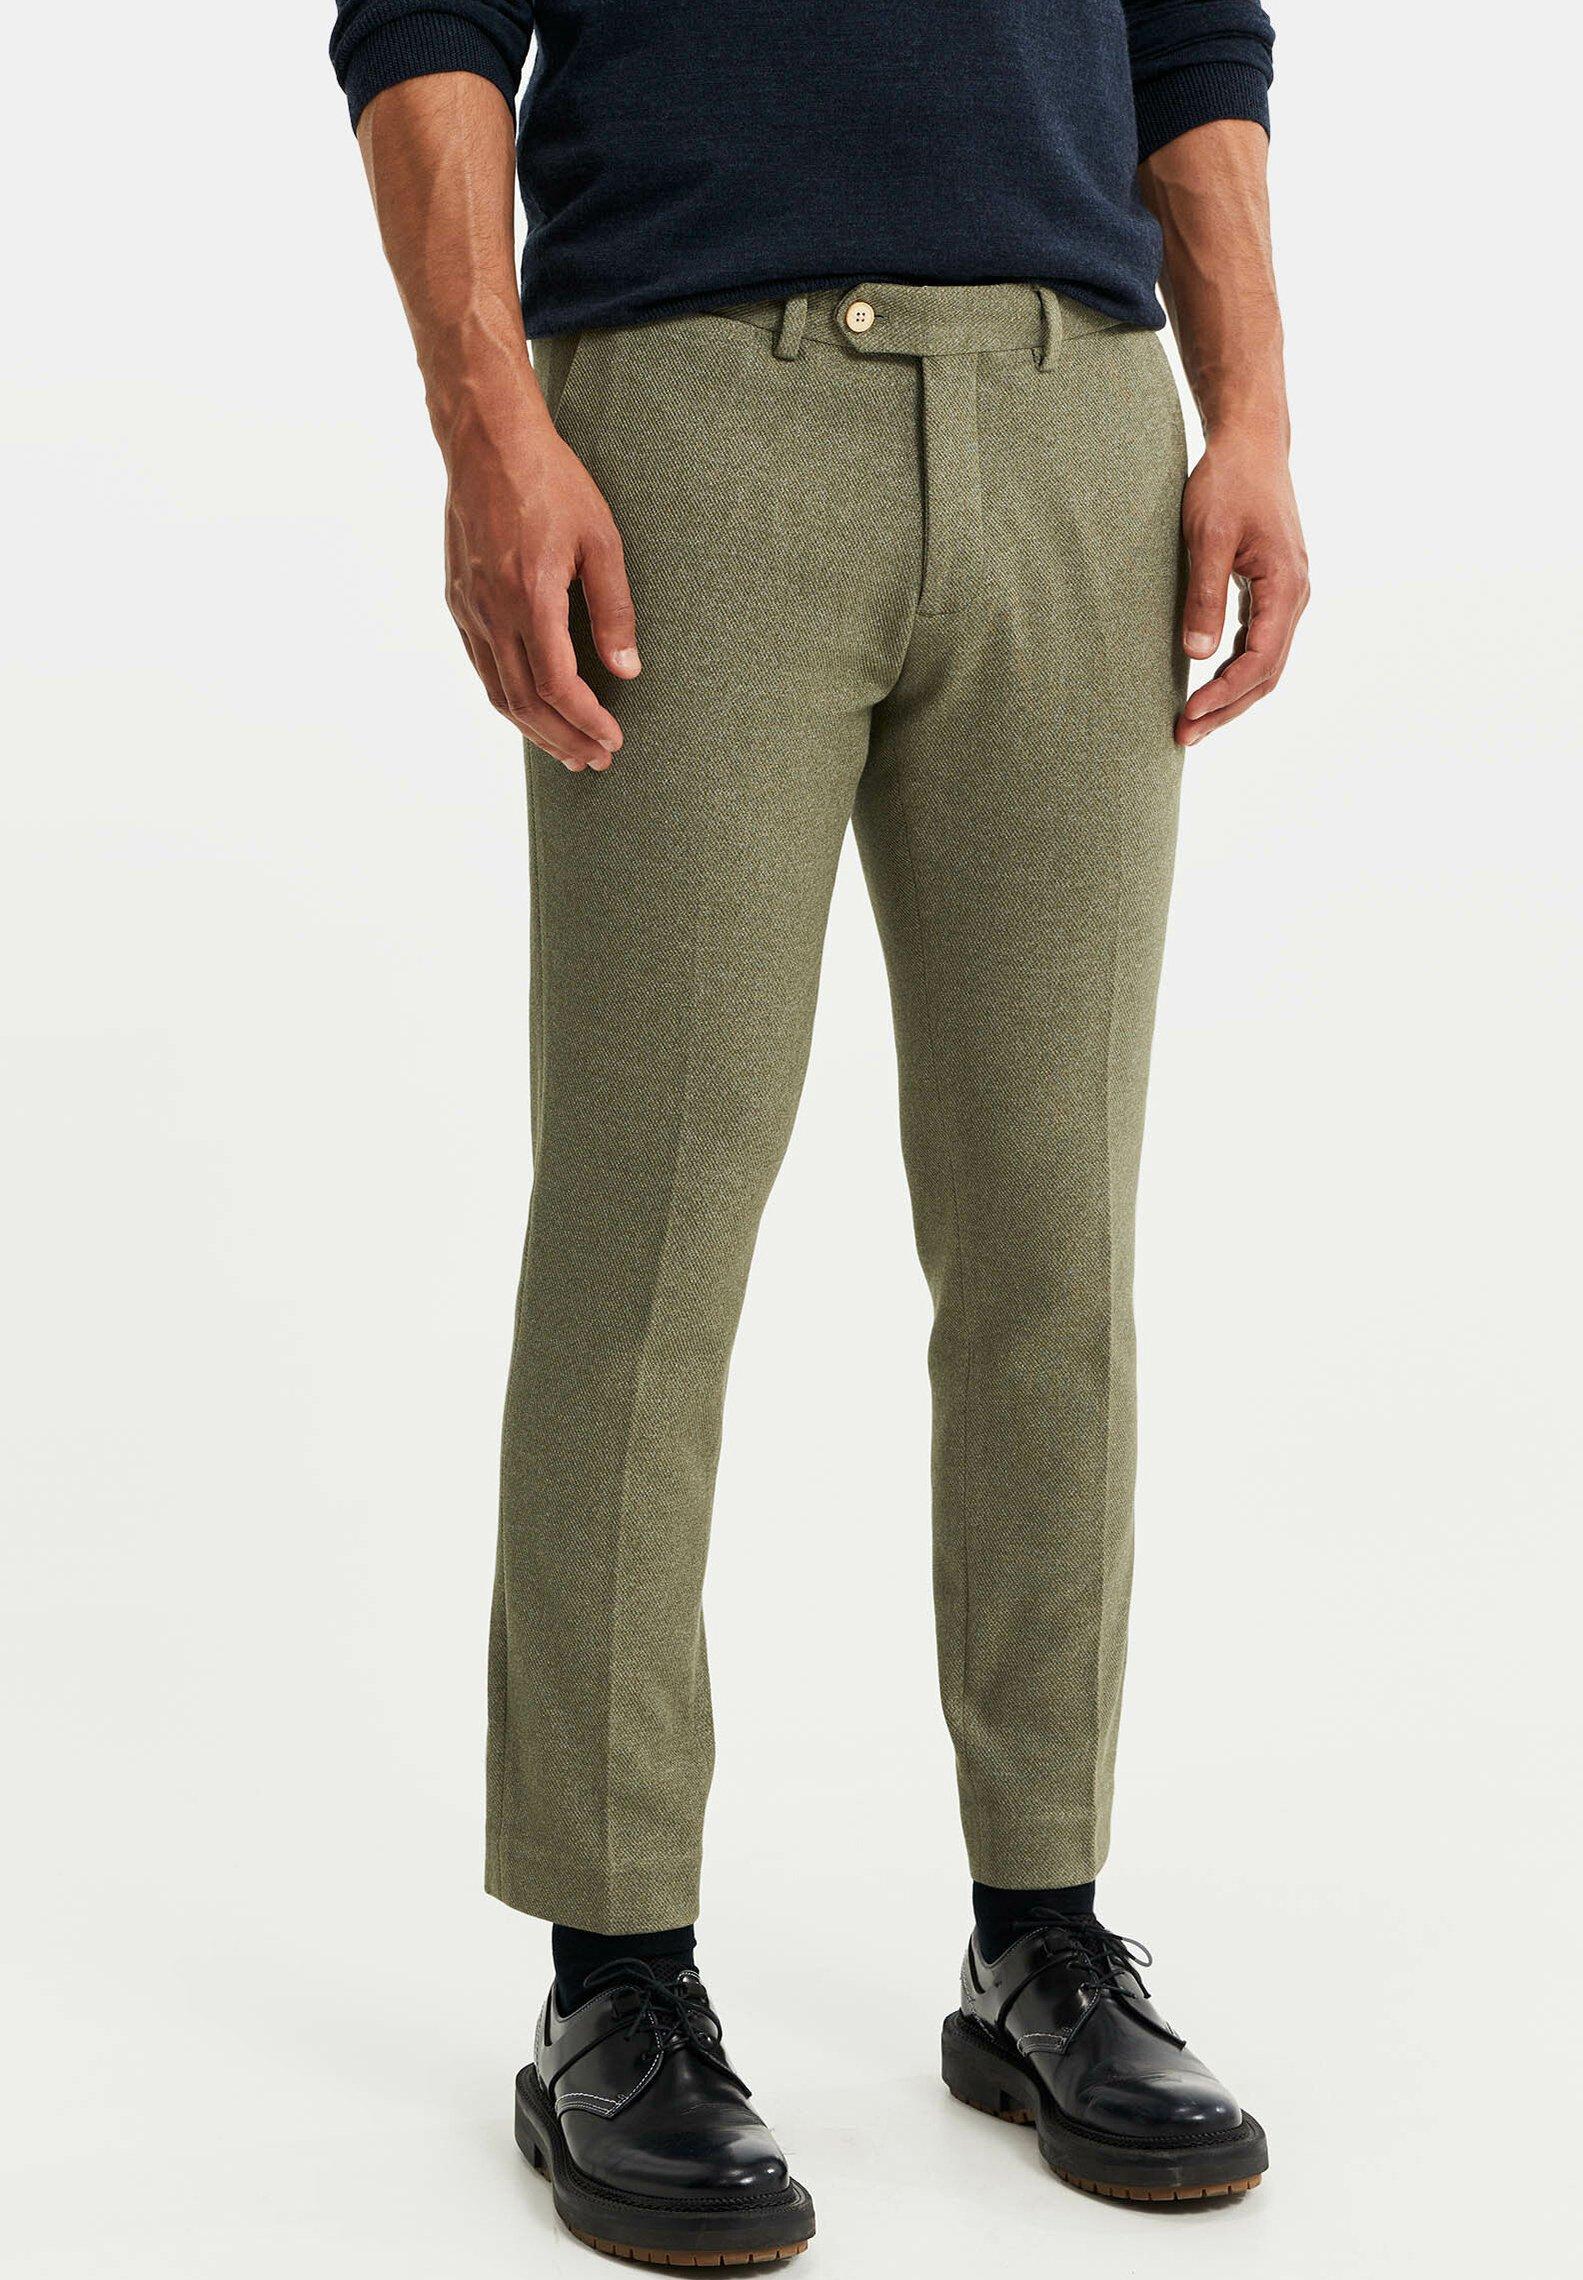 Uomo HEREN SLIM FIT PANTALON - Pantaloni